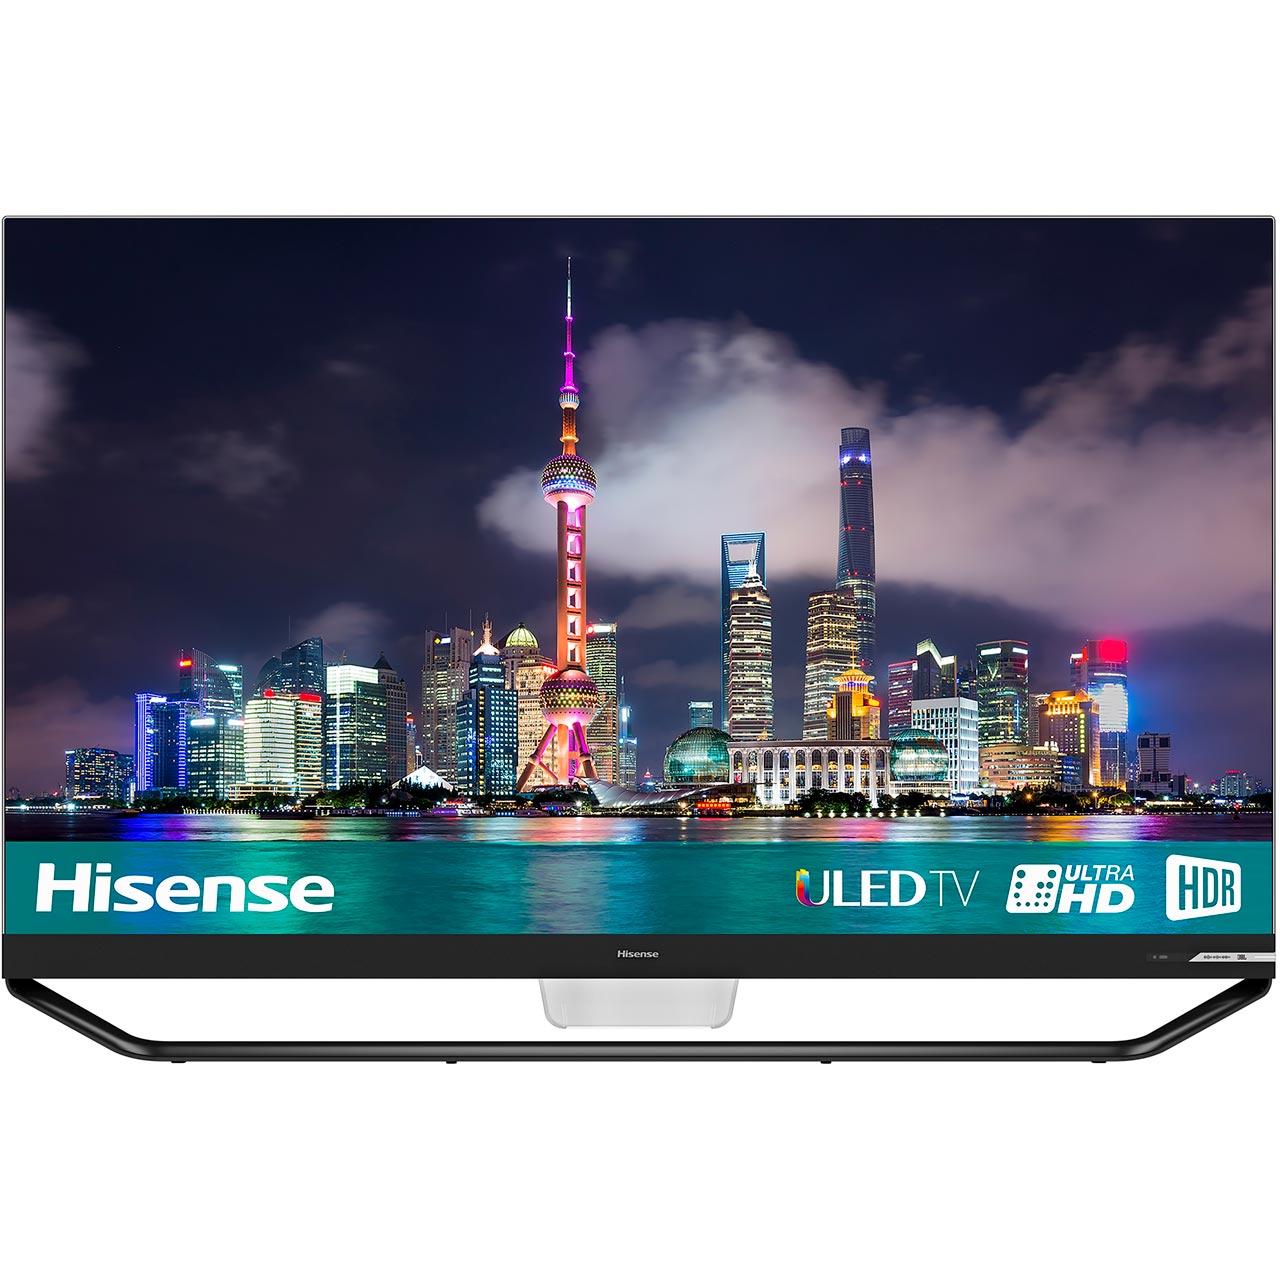 H65u9auk Hisense Uled Tv 65 Inch Aocom Review